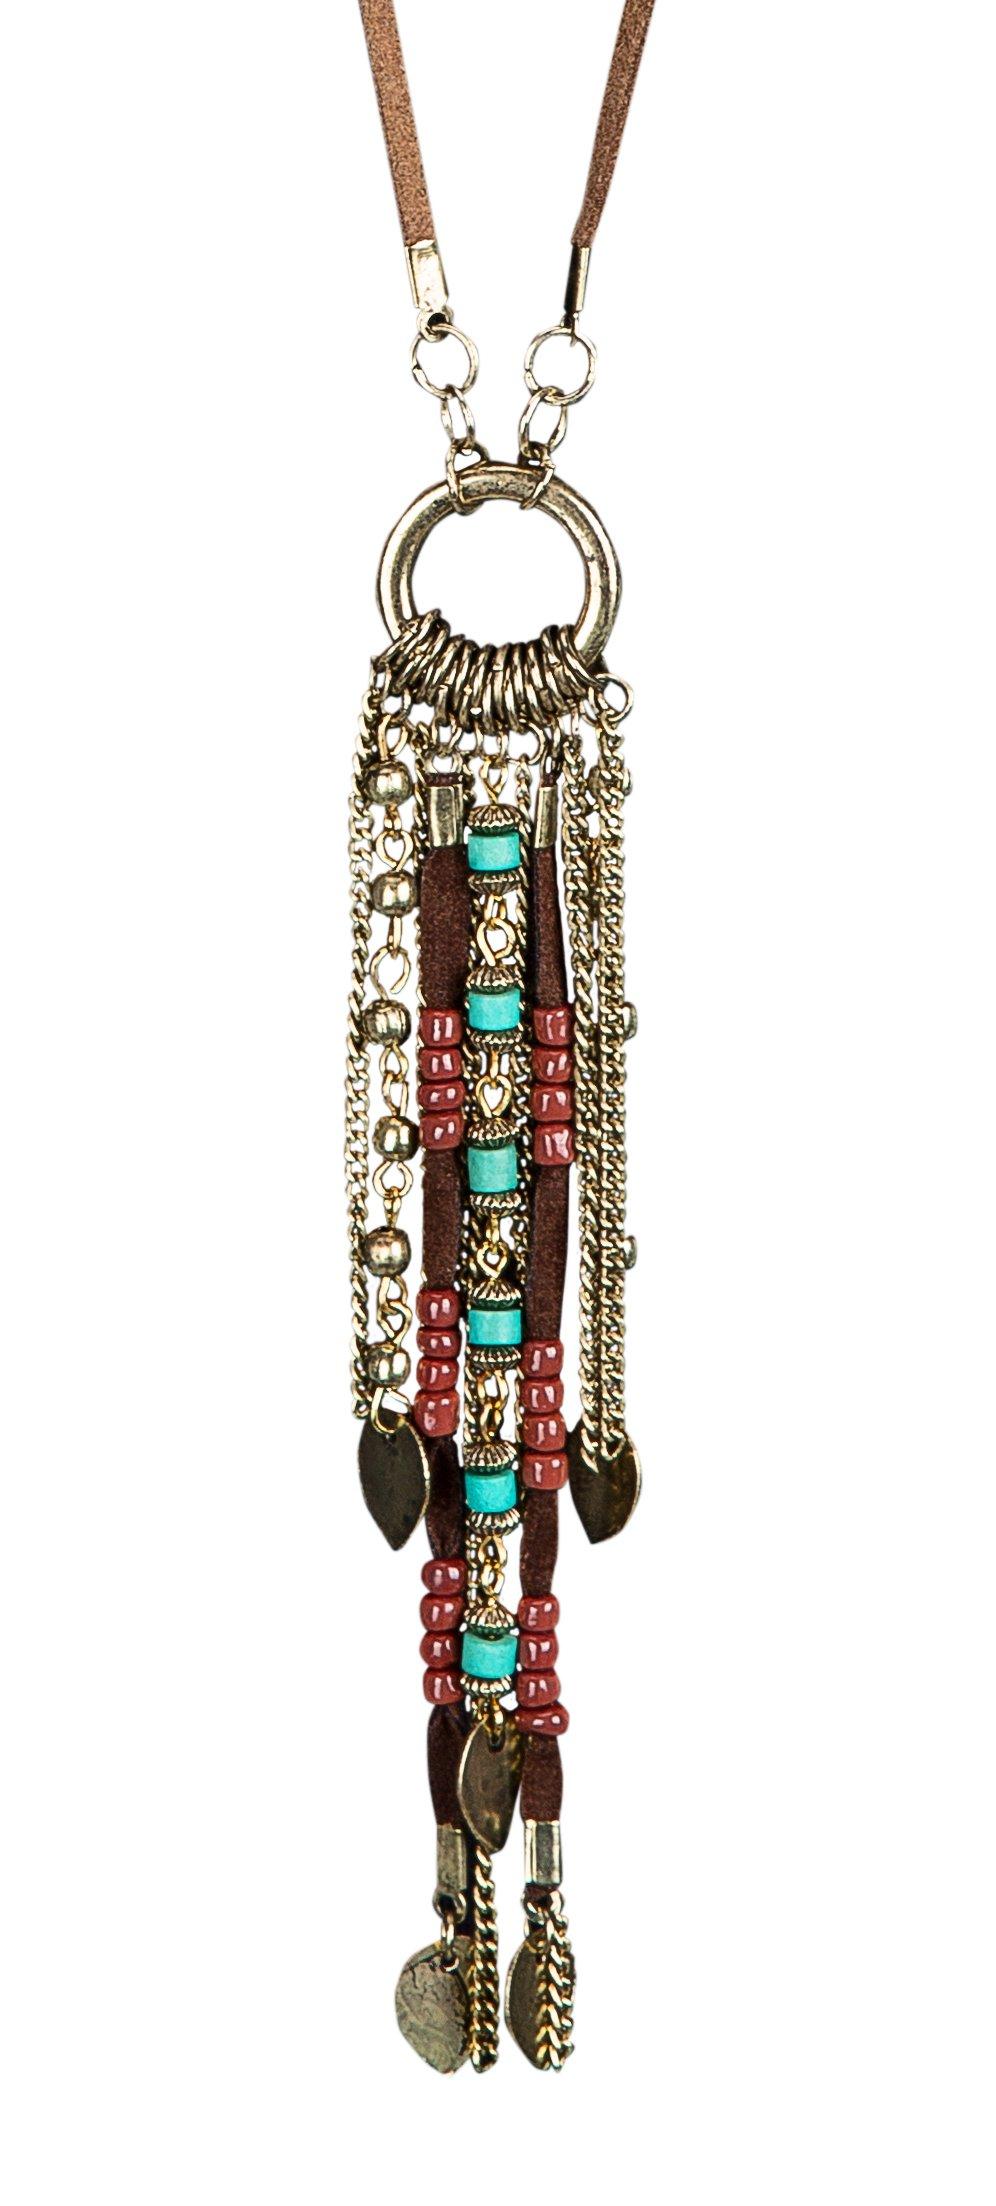 SPUNKYsoul New! Handmade Boho Genuine Leather Fringe Necklace for Women Collection